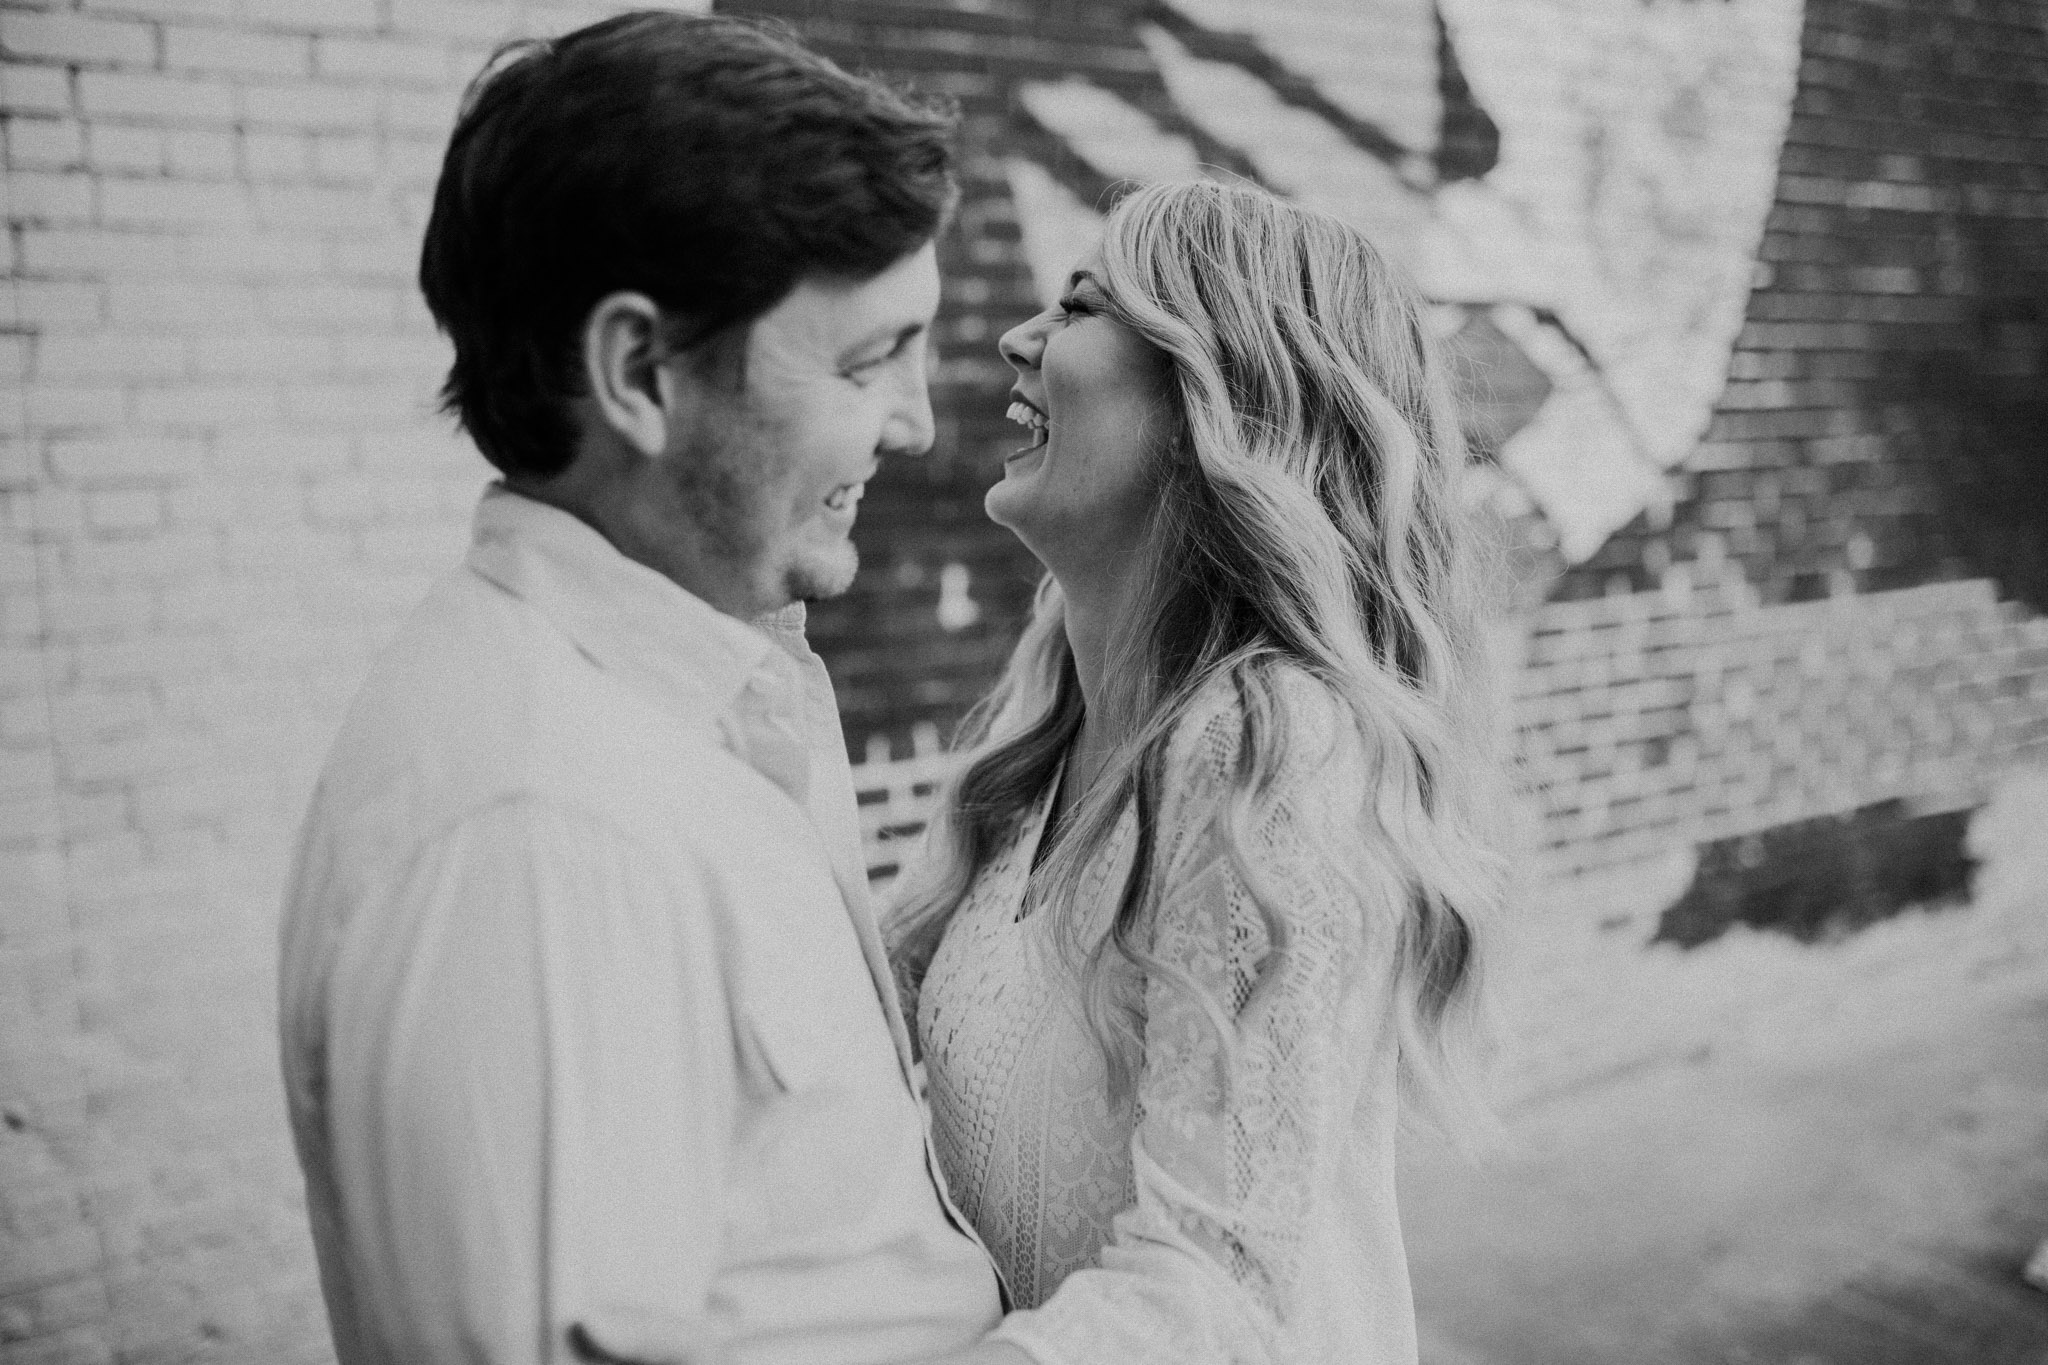 Angelle&Charlie_DFW_Wedding_Photography_01.jpg